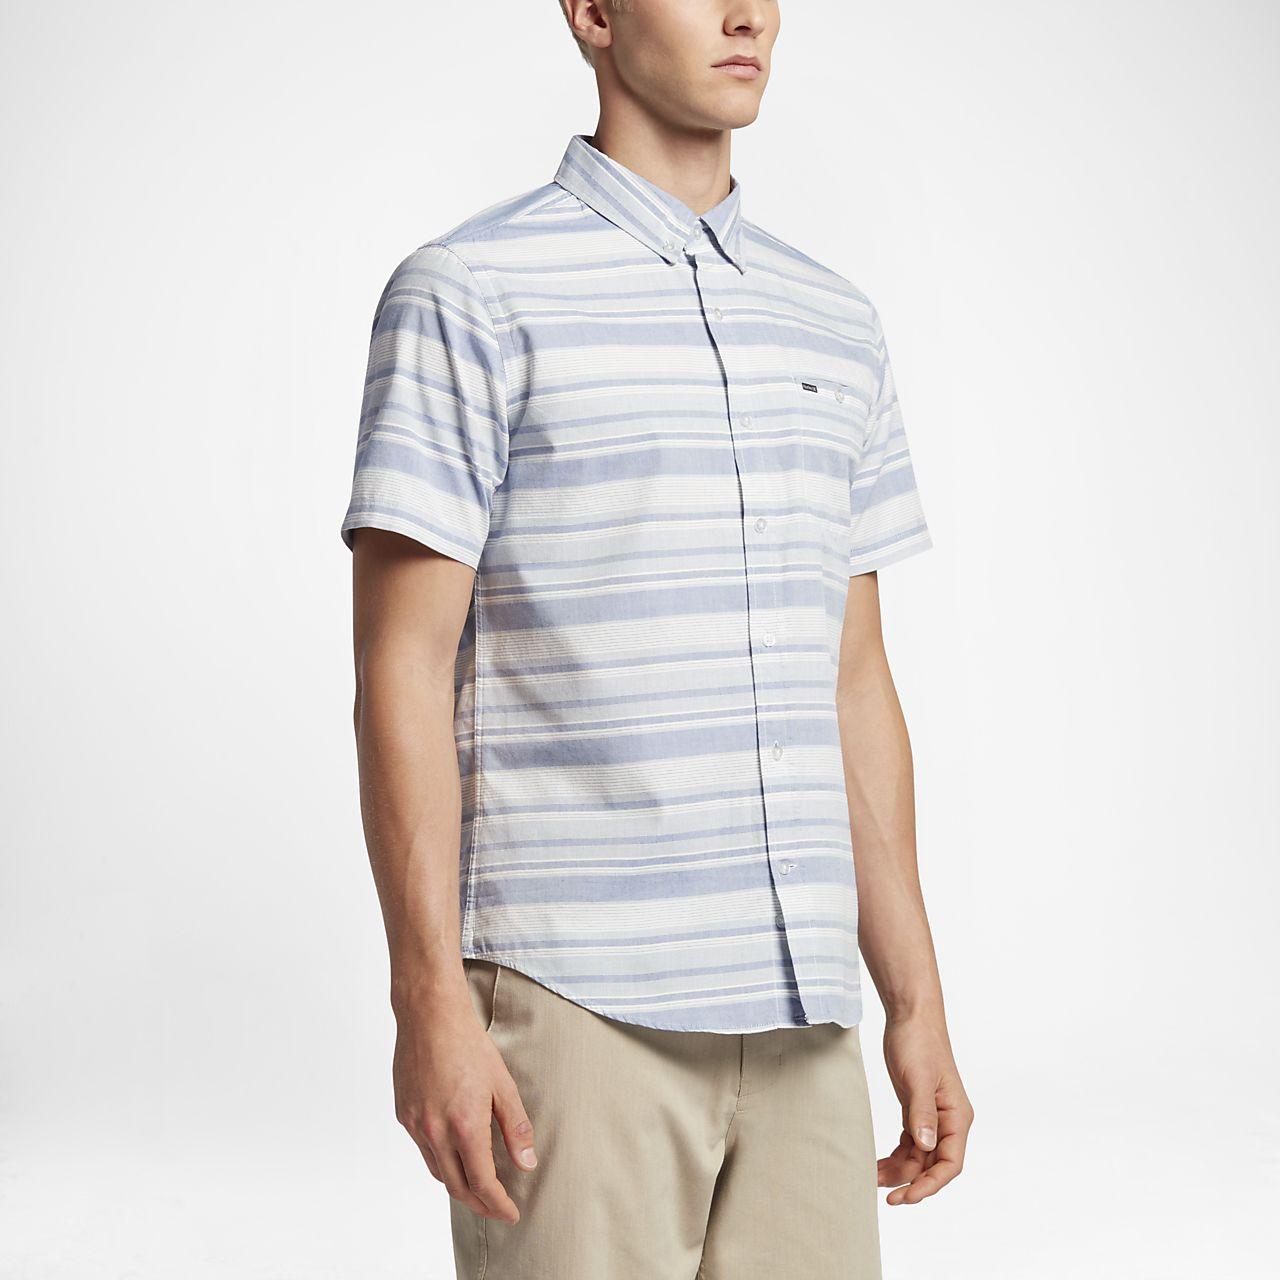 Hurley Froth Men's Short Sleeve Shirts Game Royal/Blue